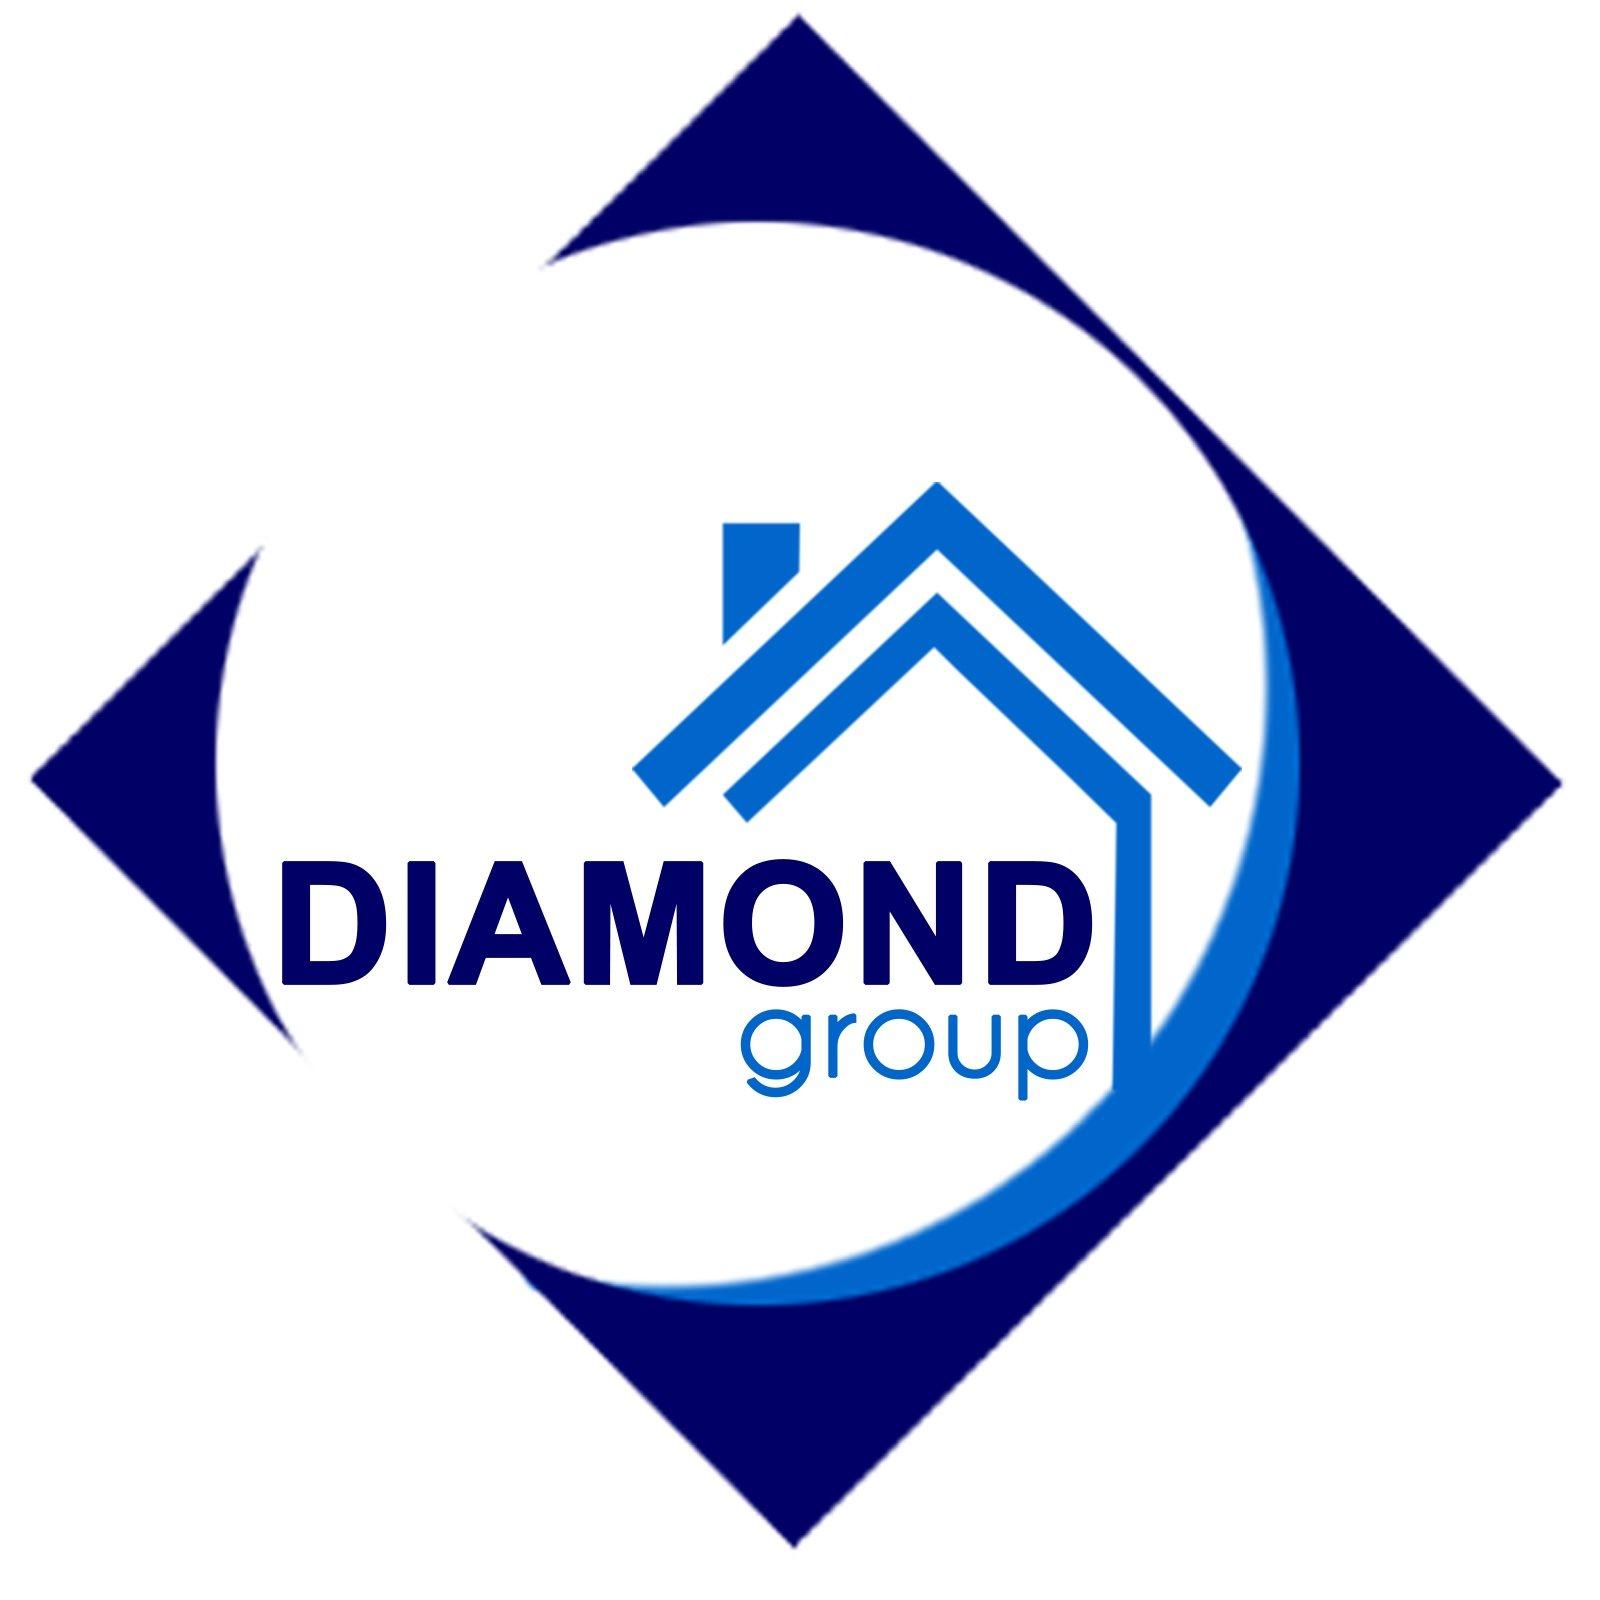 Diamond Group Iloilo